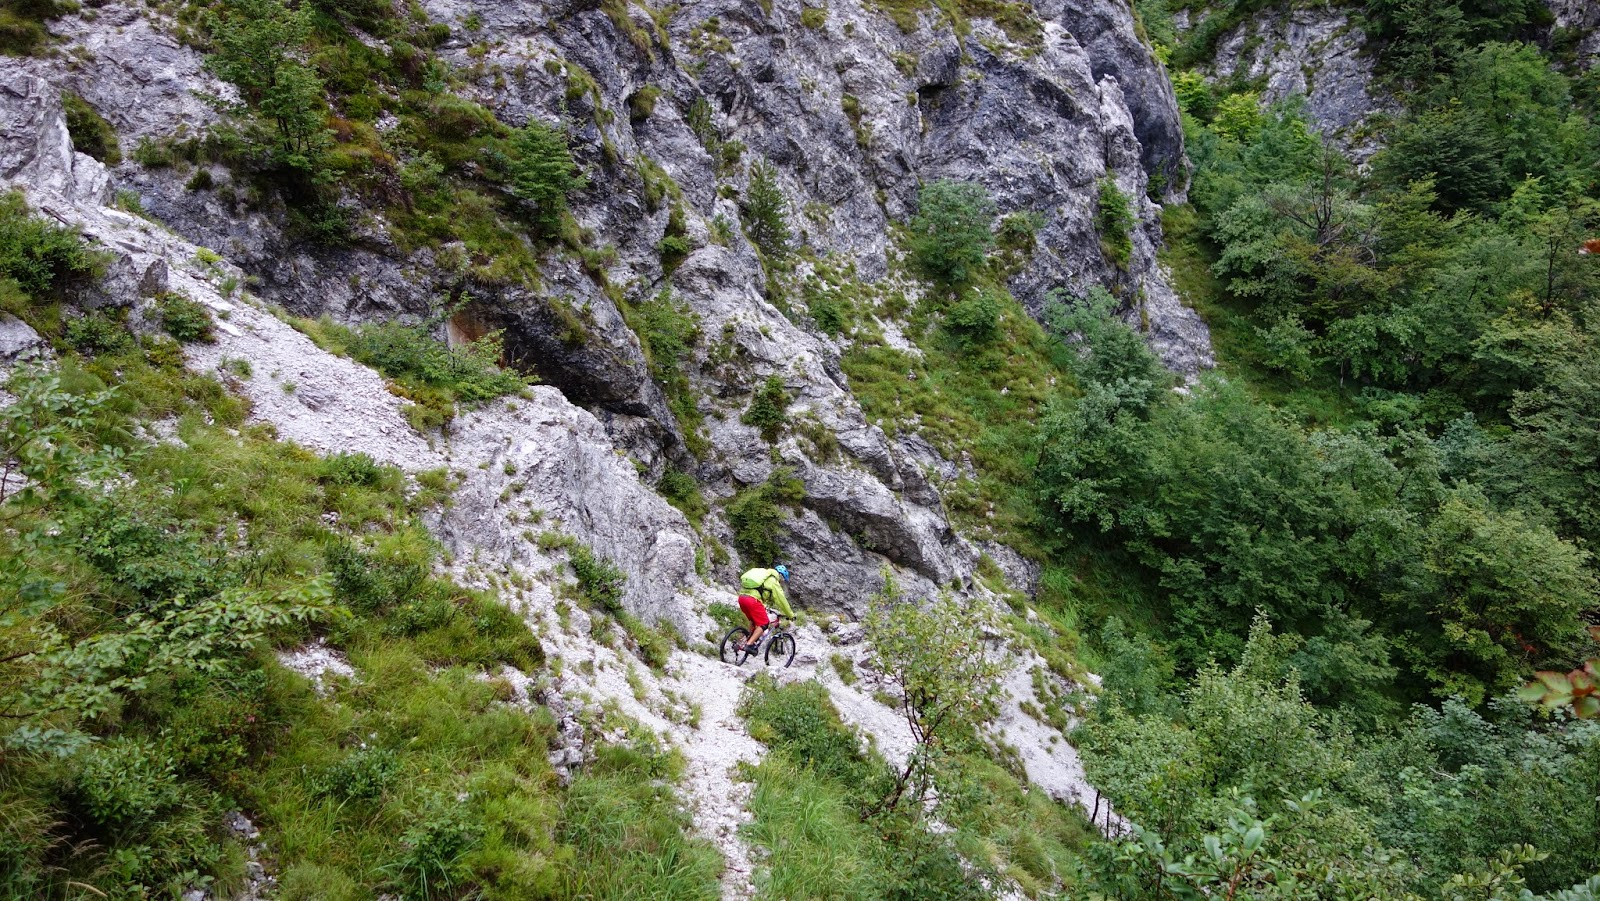 bikebergsteigen Mountainbike Tour: Val Resia Bovec (Slowenien)